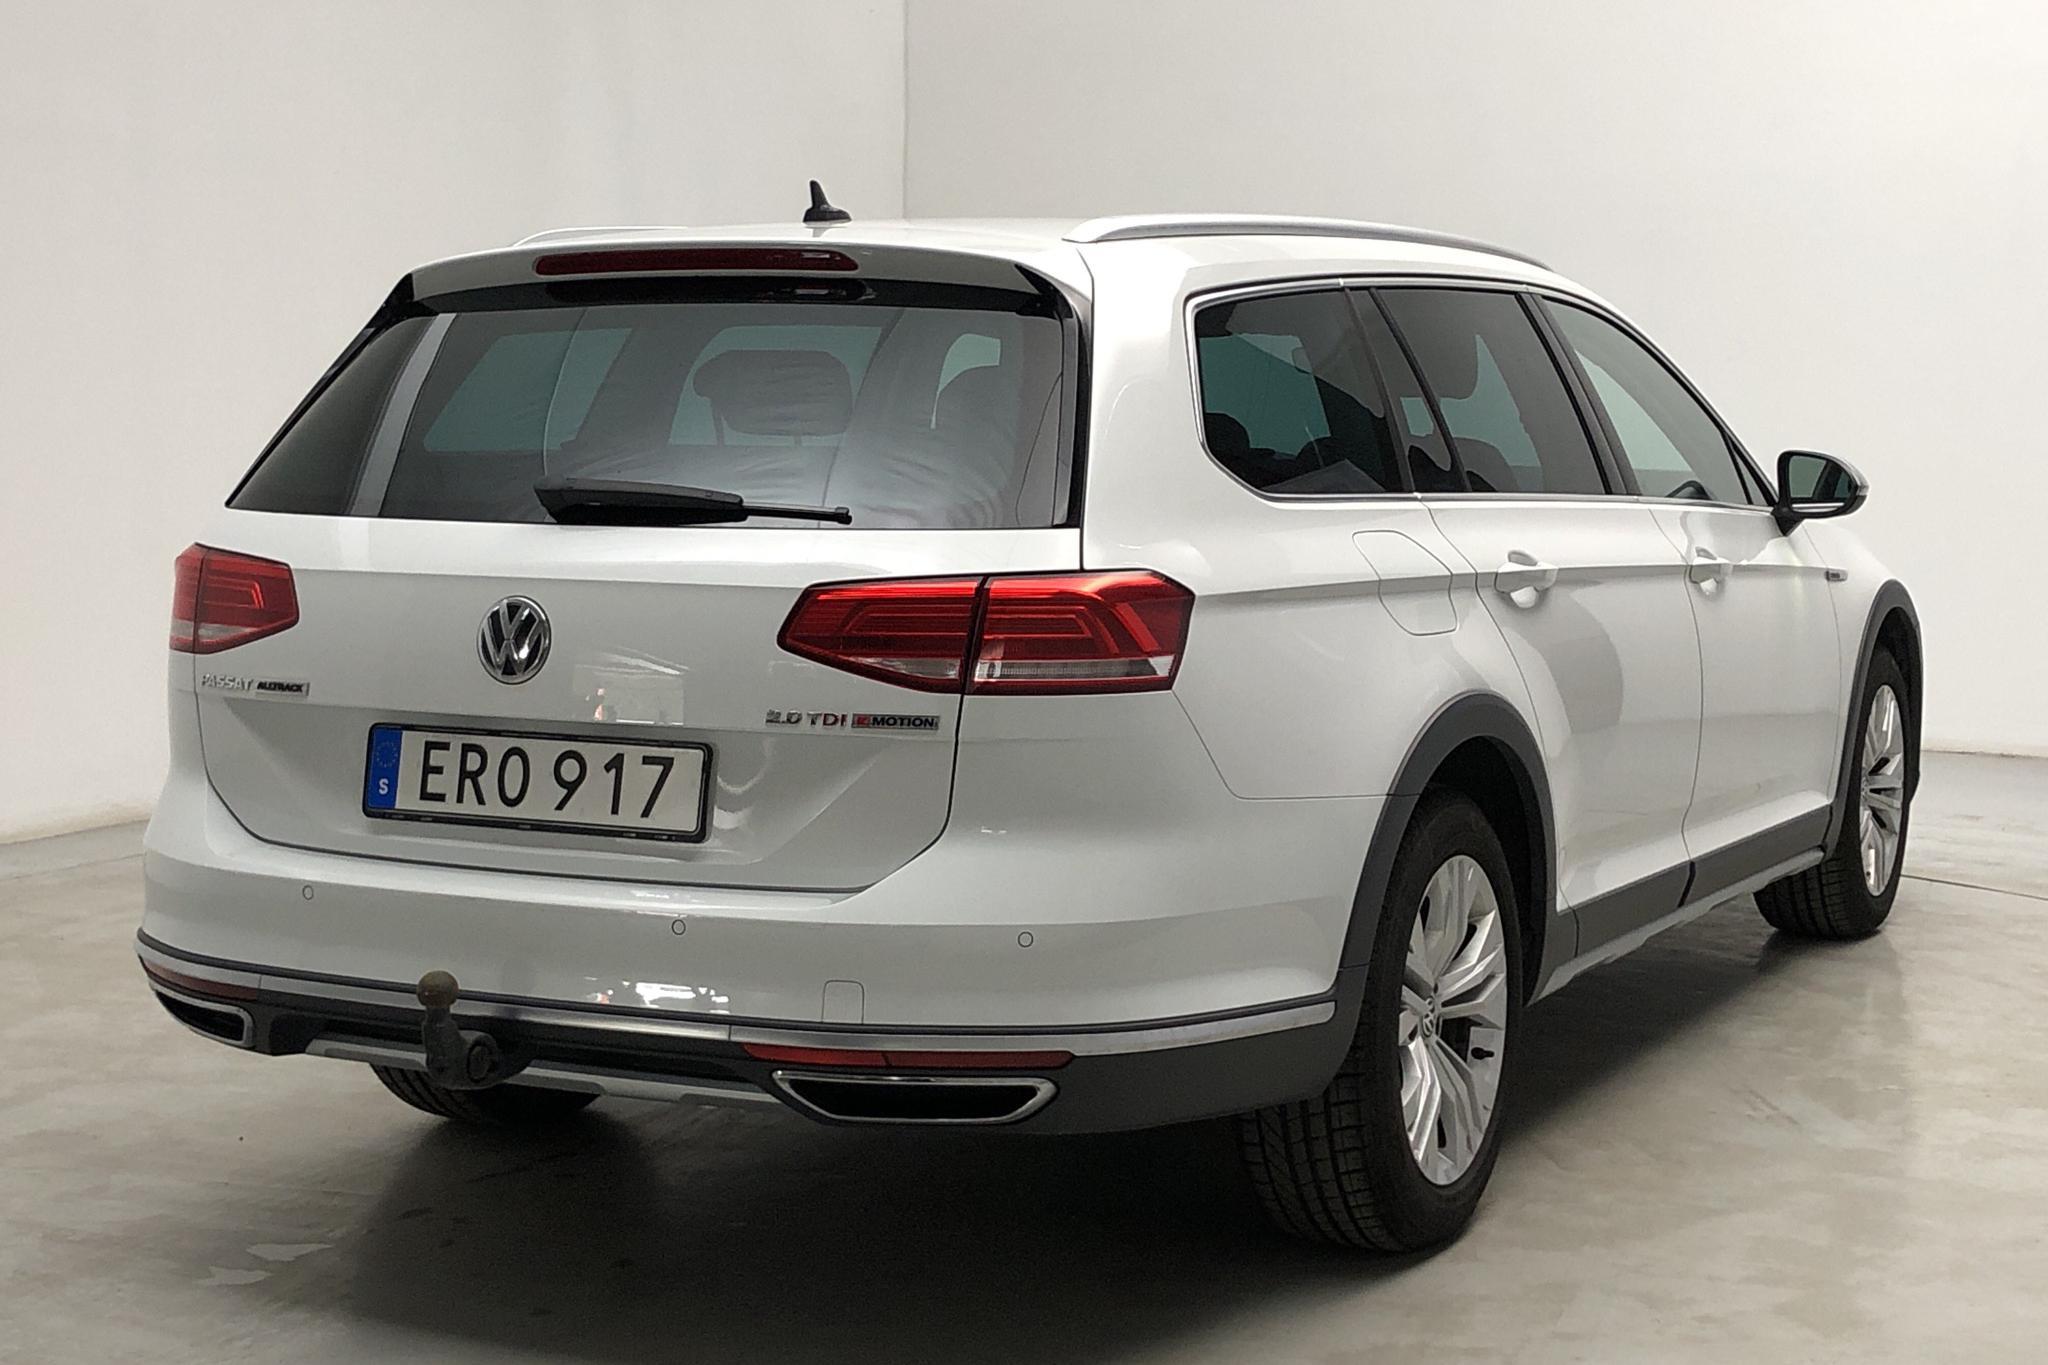 VW Passat Alltrack 2.0 TDI Sportscombi 4MOTION (190hk) - 9 081 mil - Automat - vit - 2017